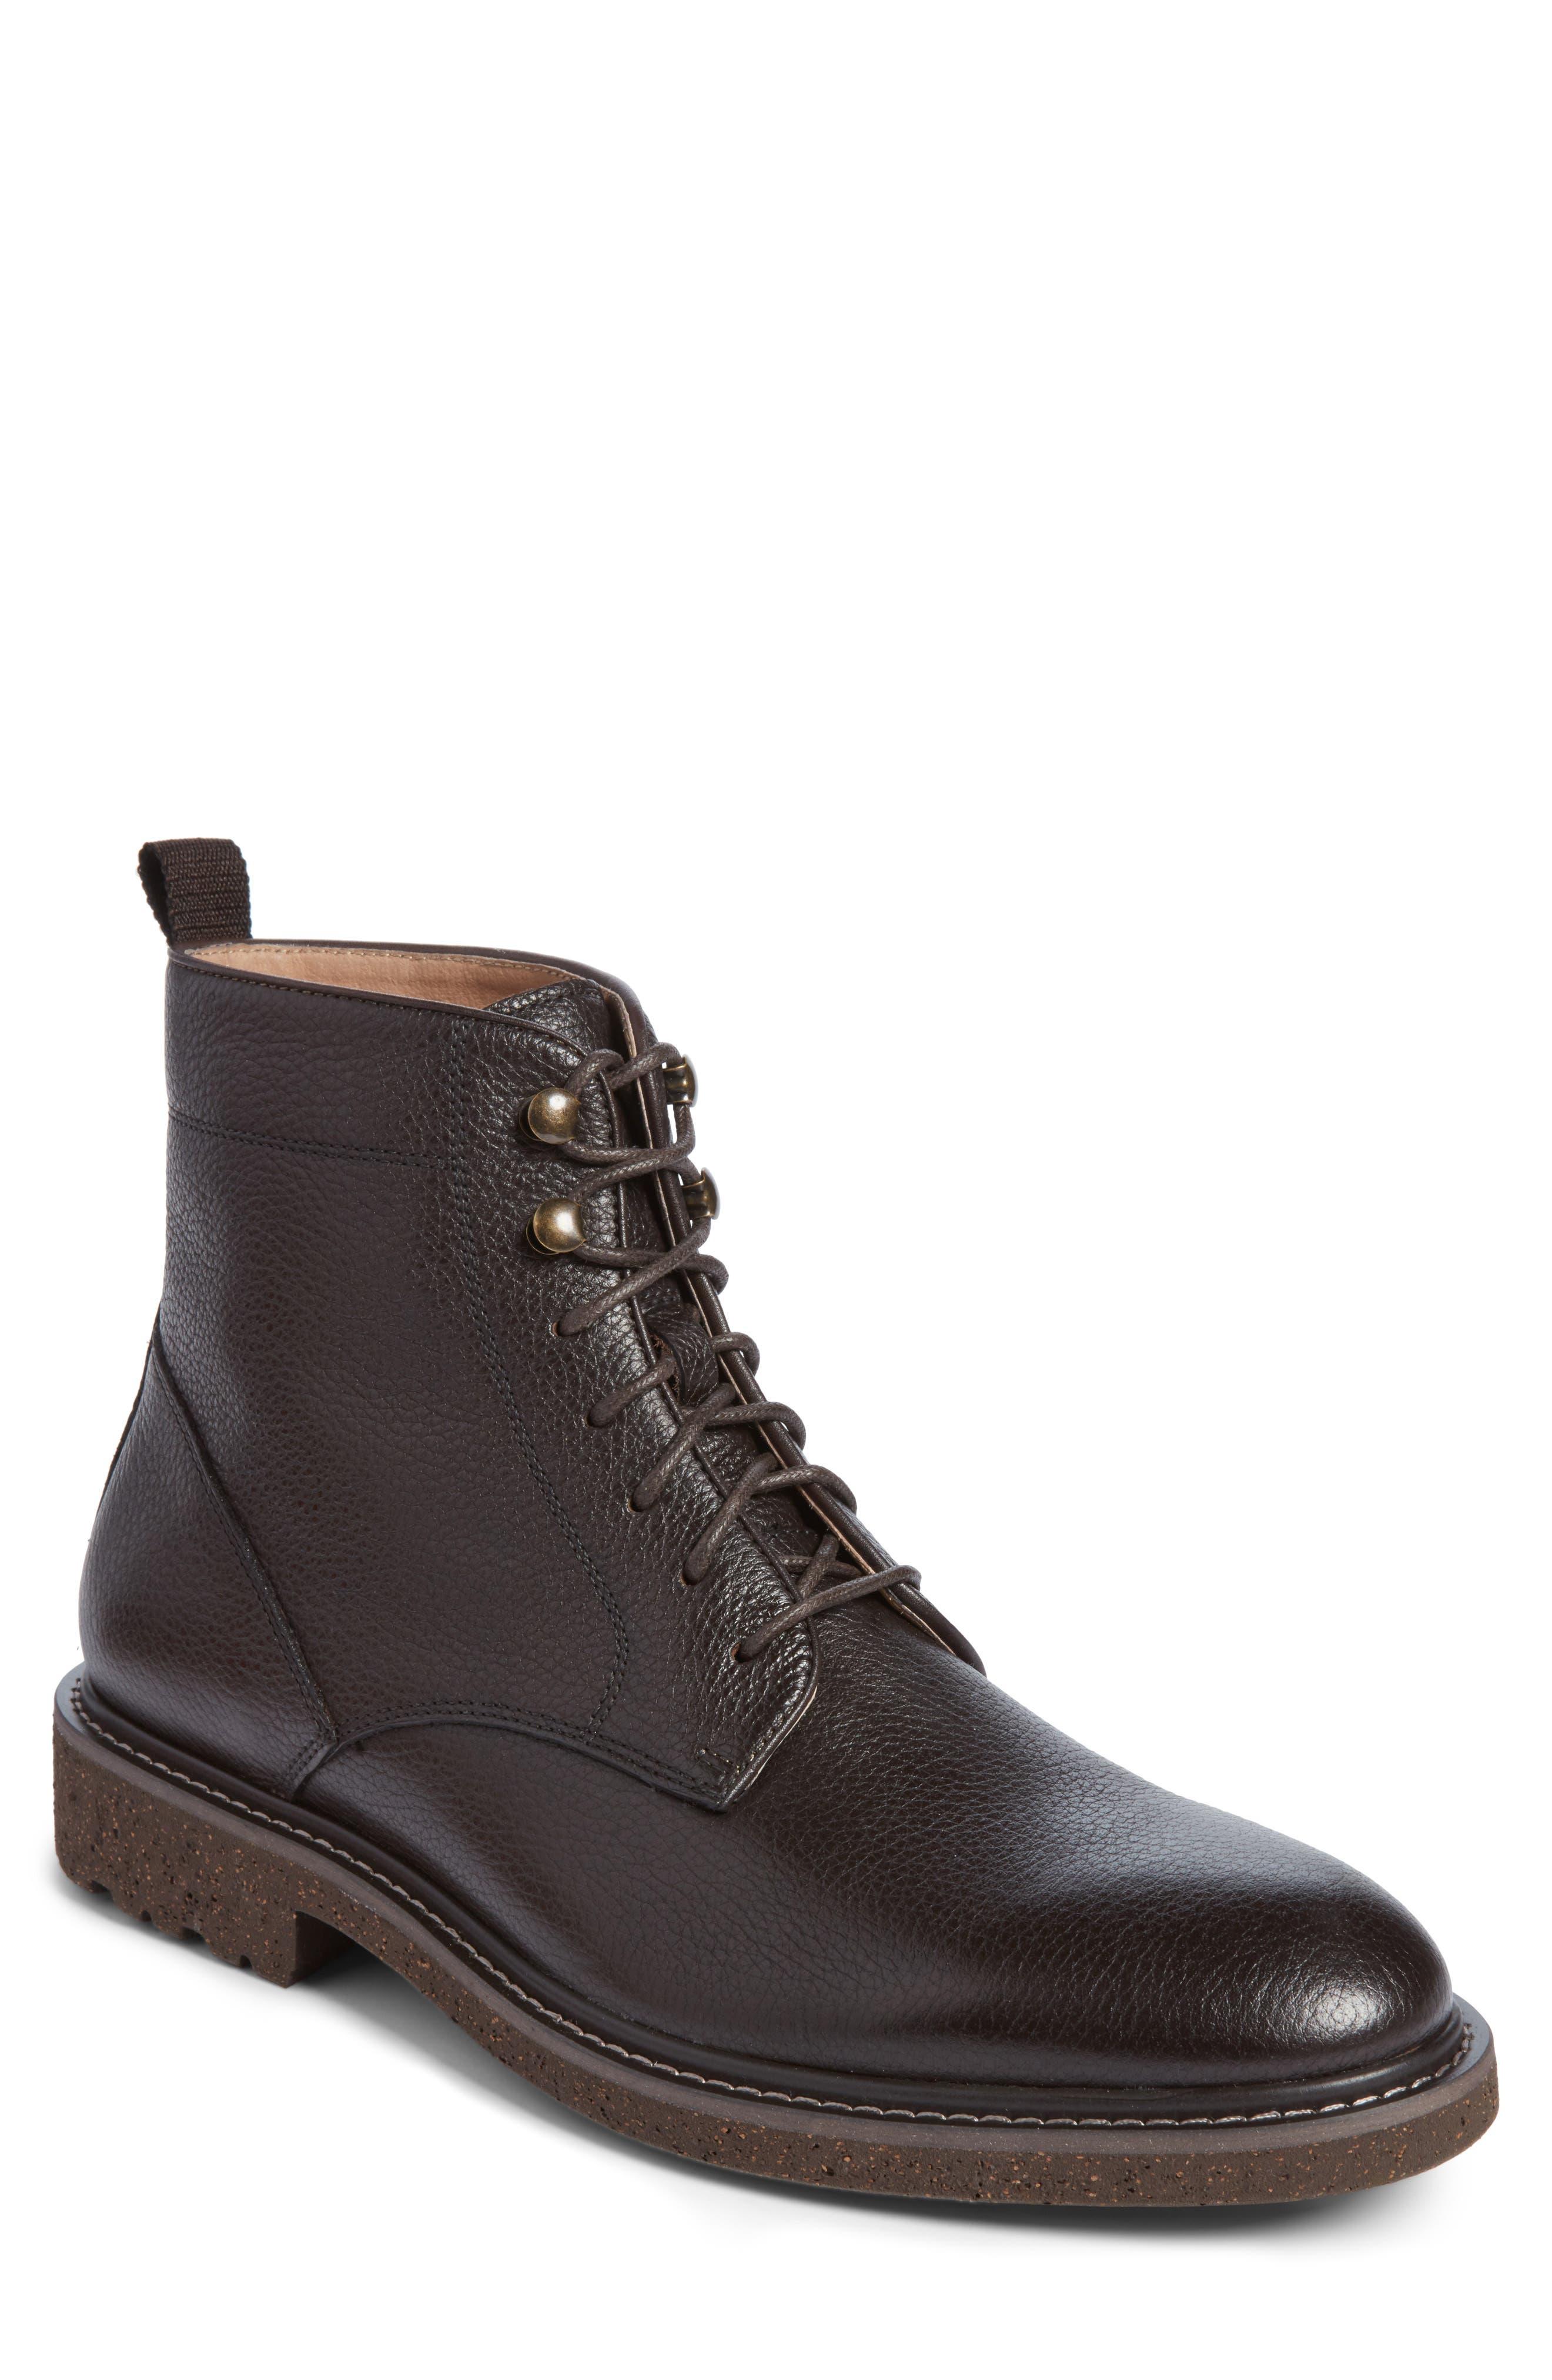 Trenton Plain Toe Boot,                             Main thumbnail 1, color,                             Chocolate Leather